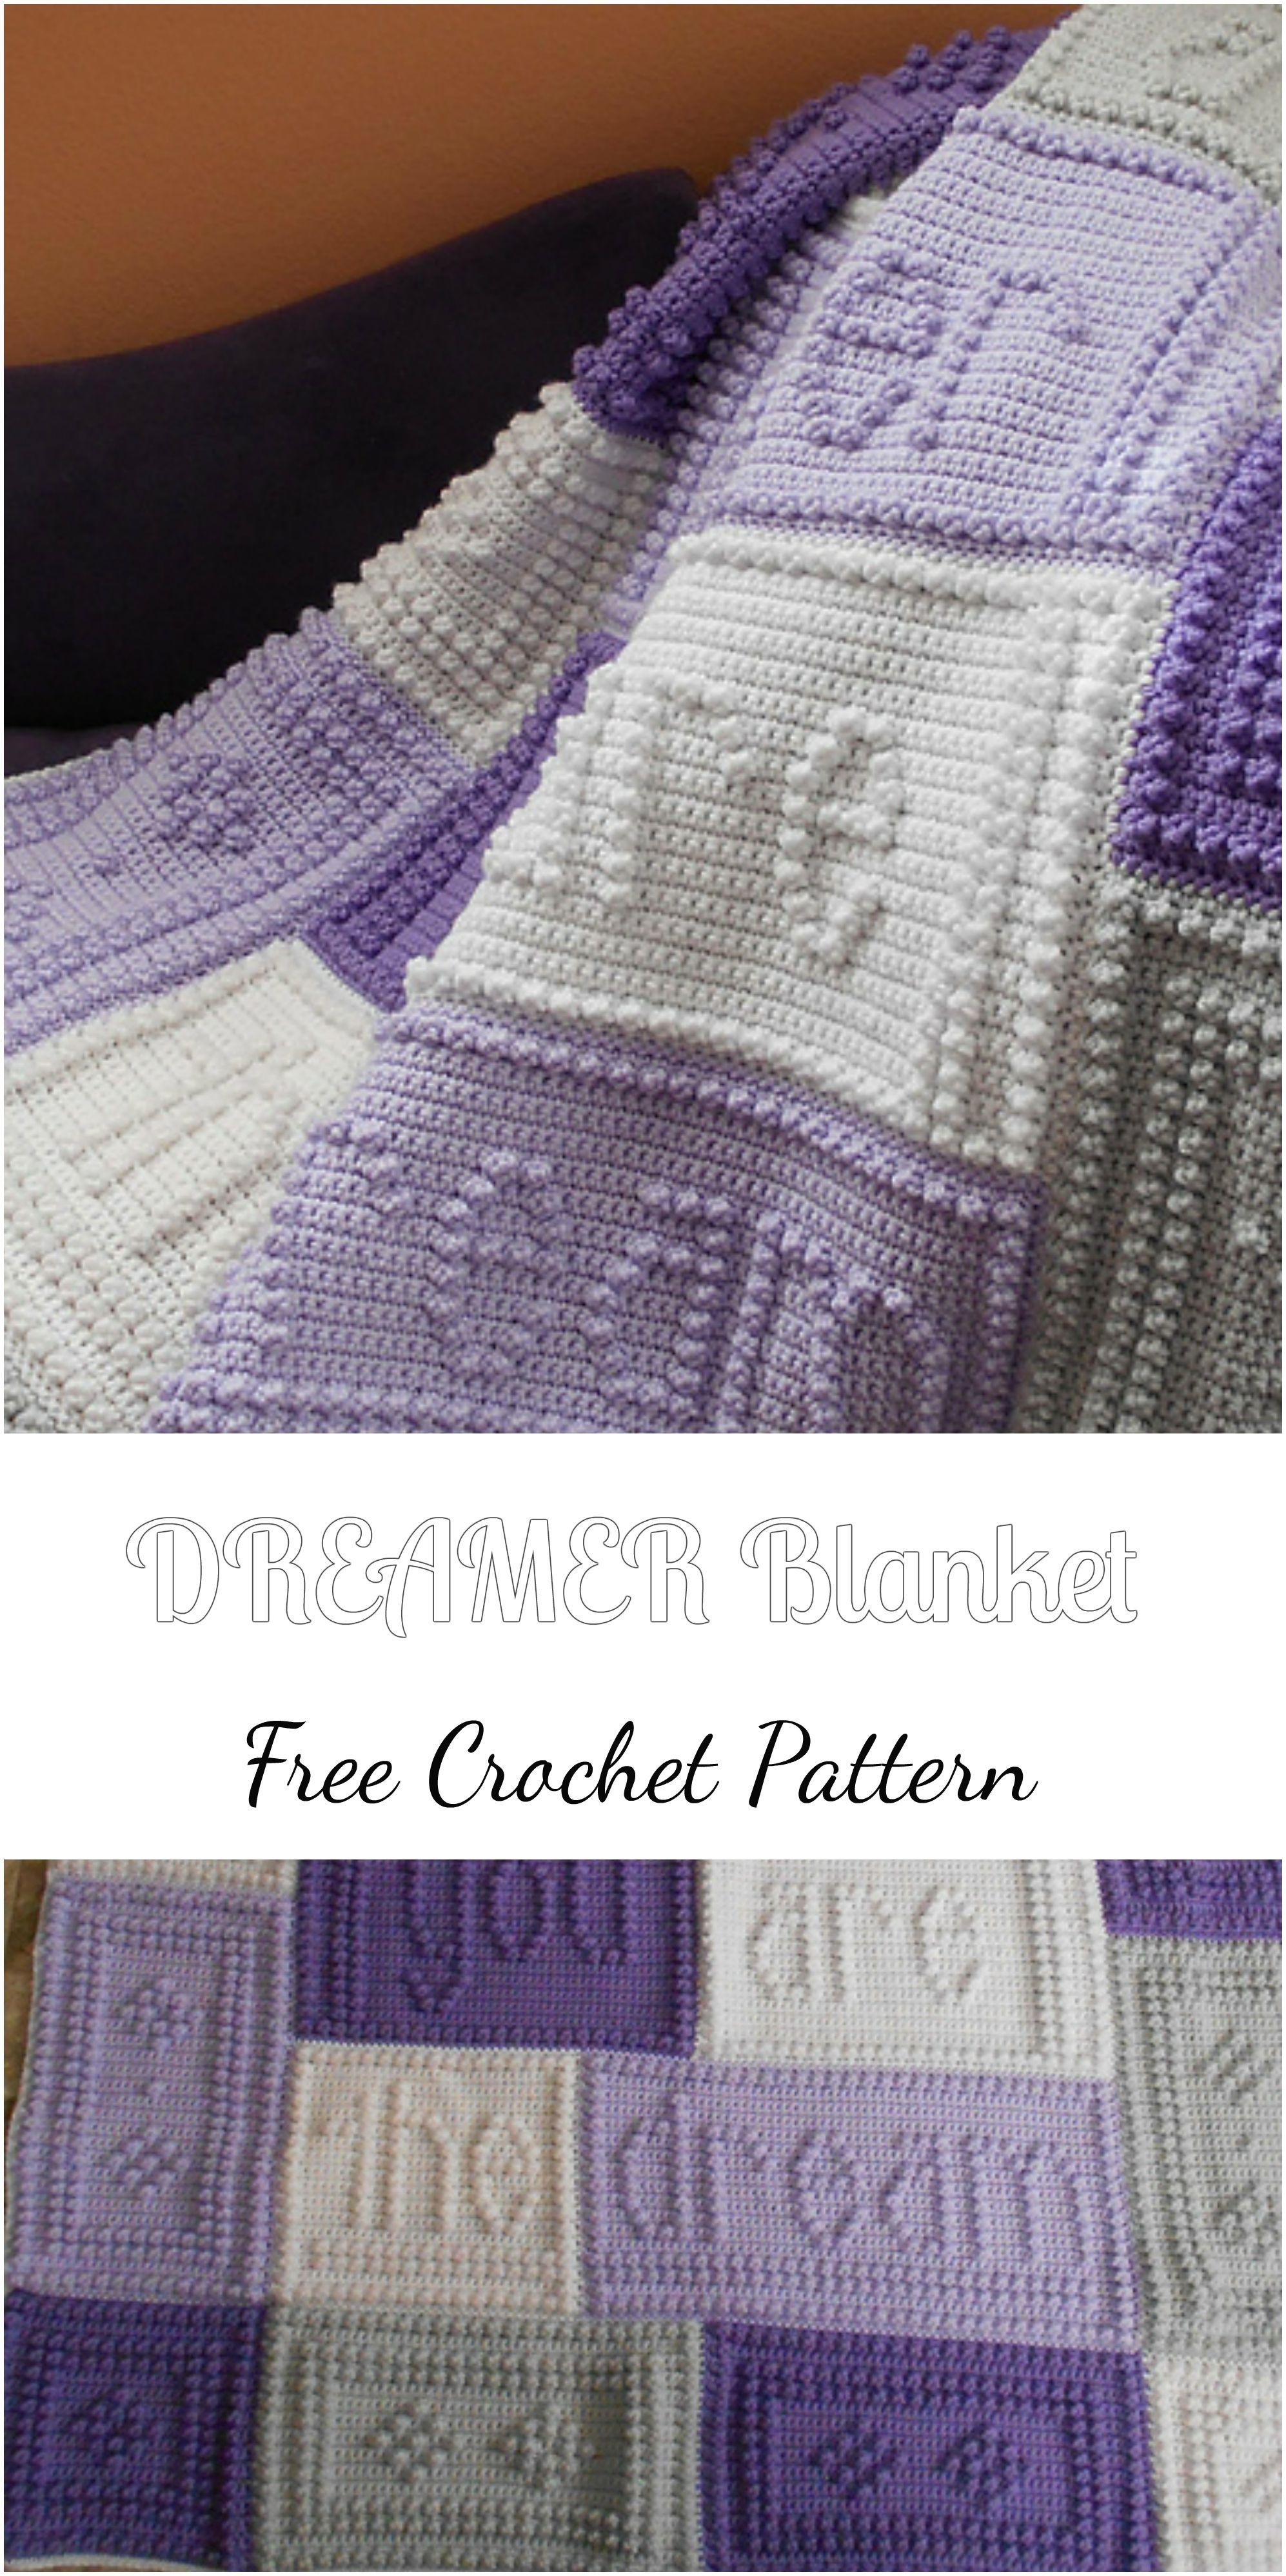 DREAMER Crochet Blanket – Free Pattern! #crocheting #blankets ...